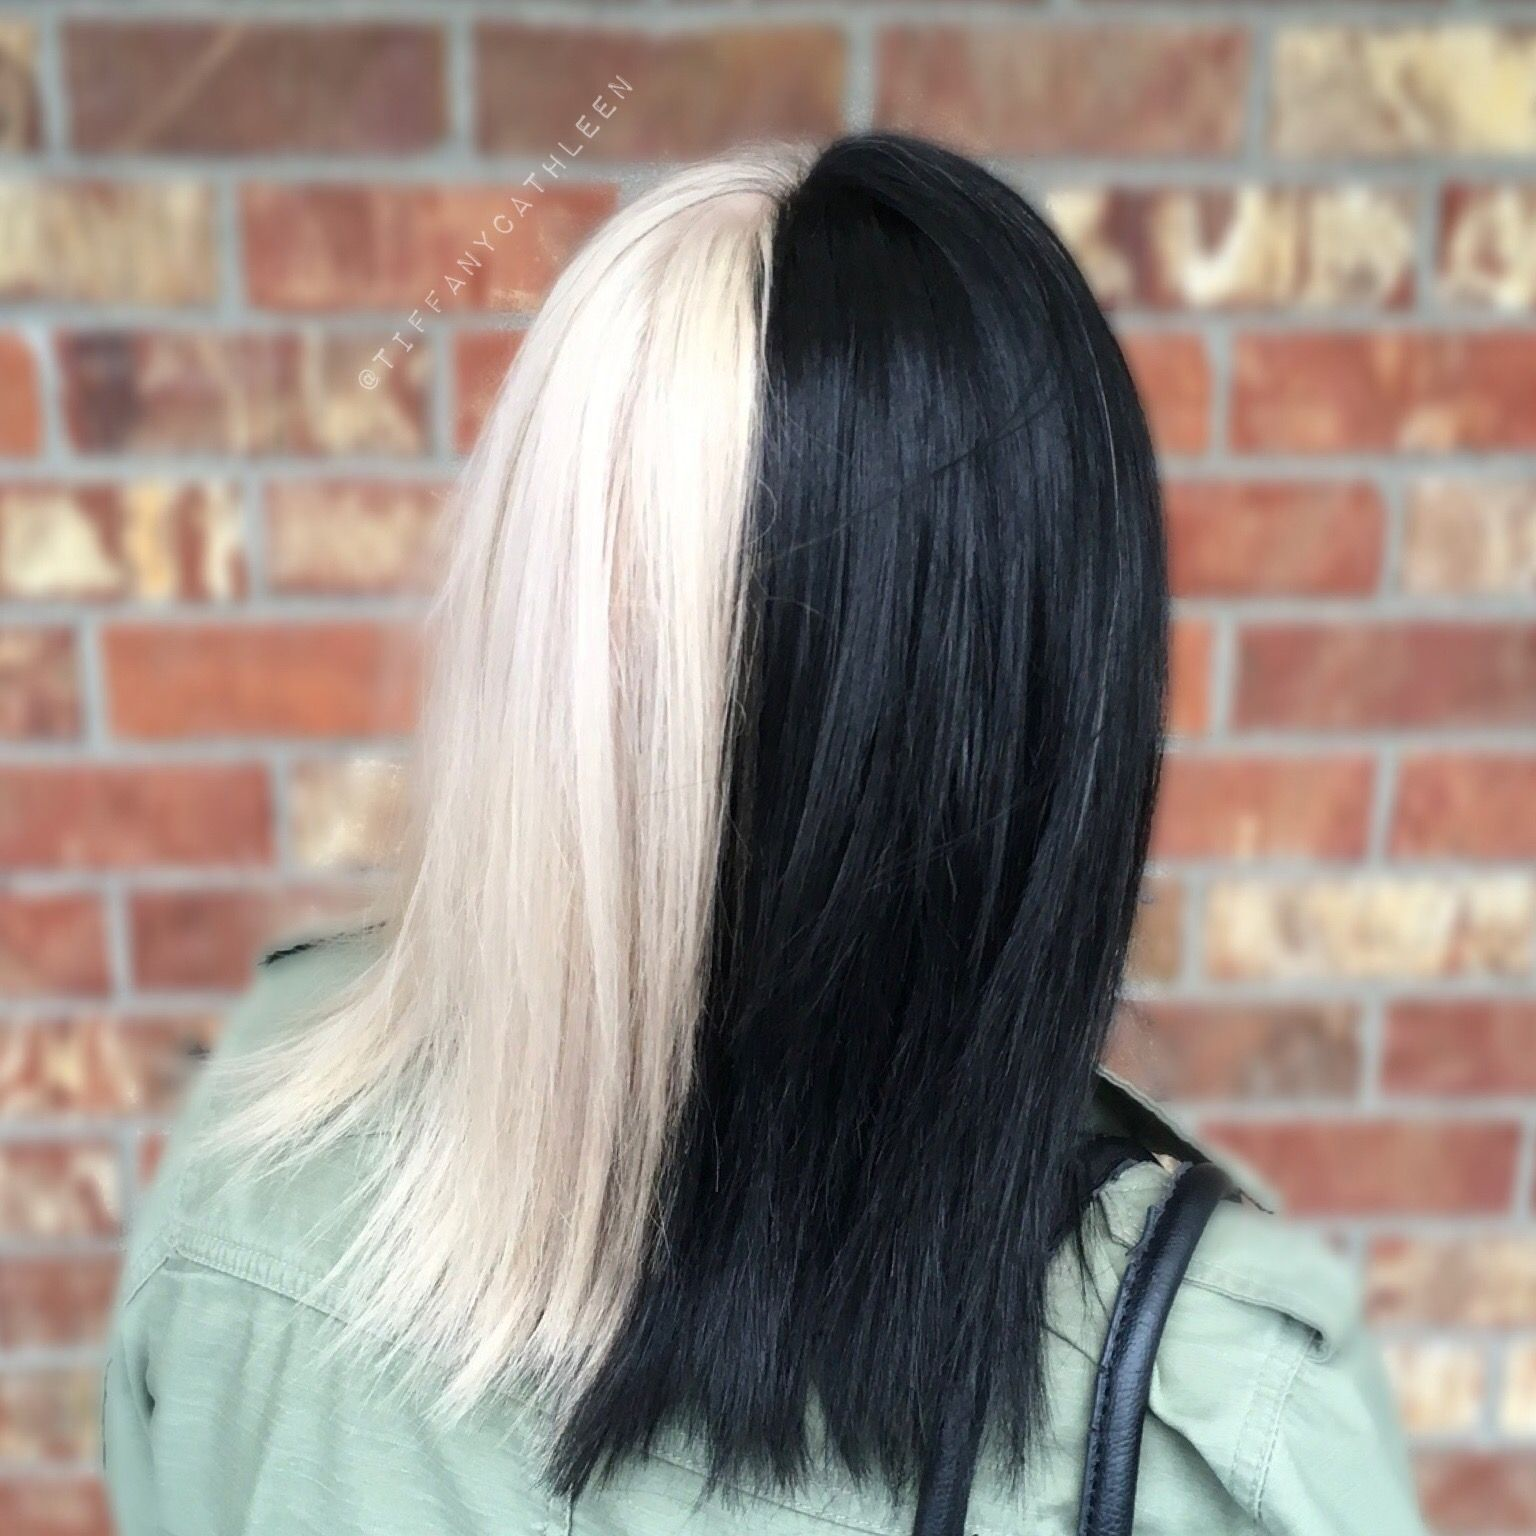 Arjun Coomaraswamy Hairstyle Split Dyed Hair Two Color Hair Hair Styles